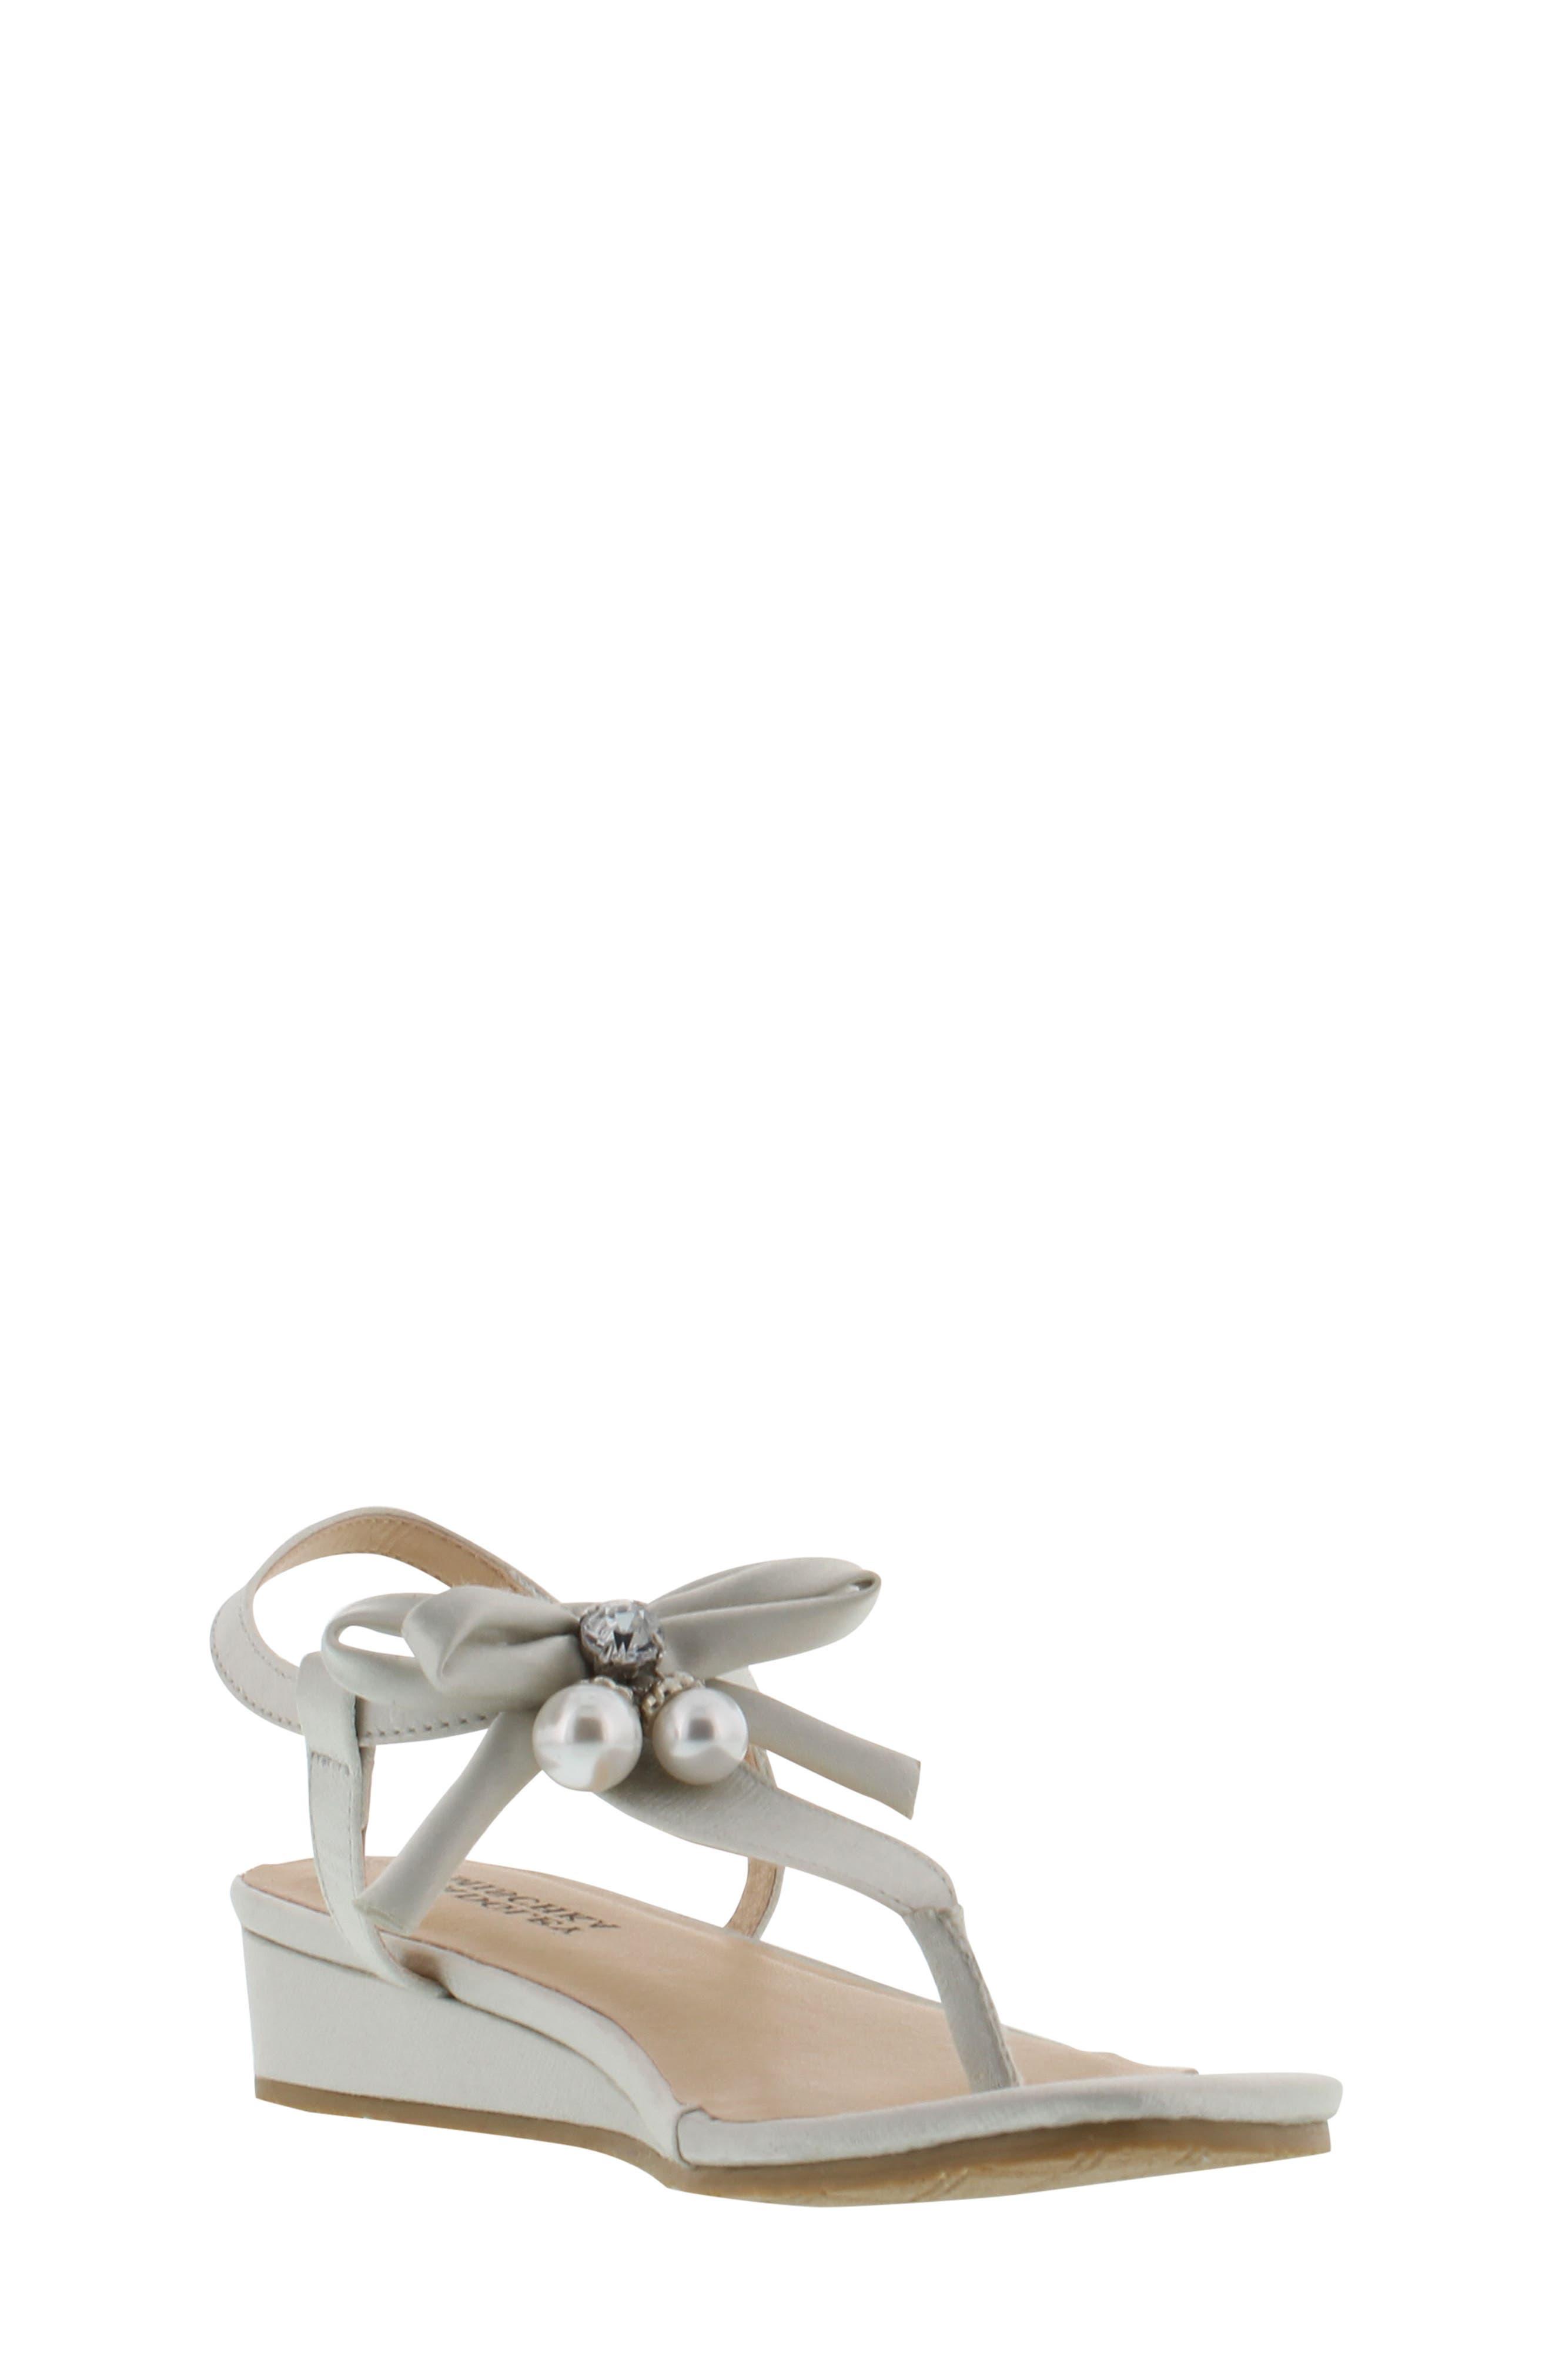 Talia Embellished Bow Sandal,                             Main thumbnail 1, color,                             Silver